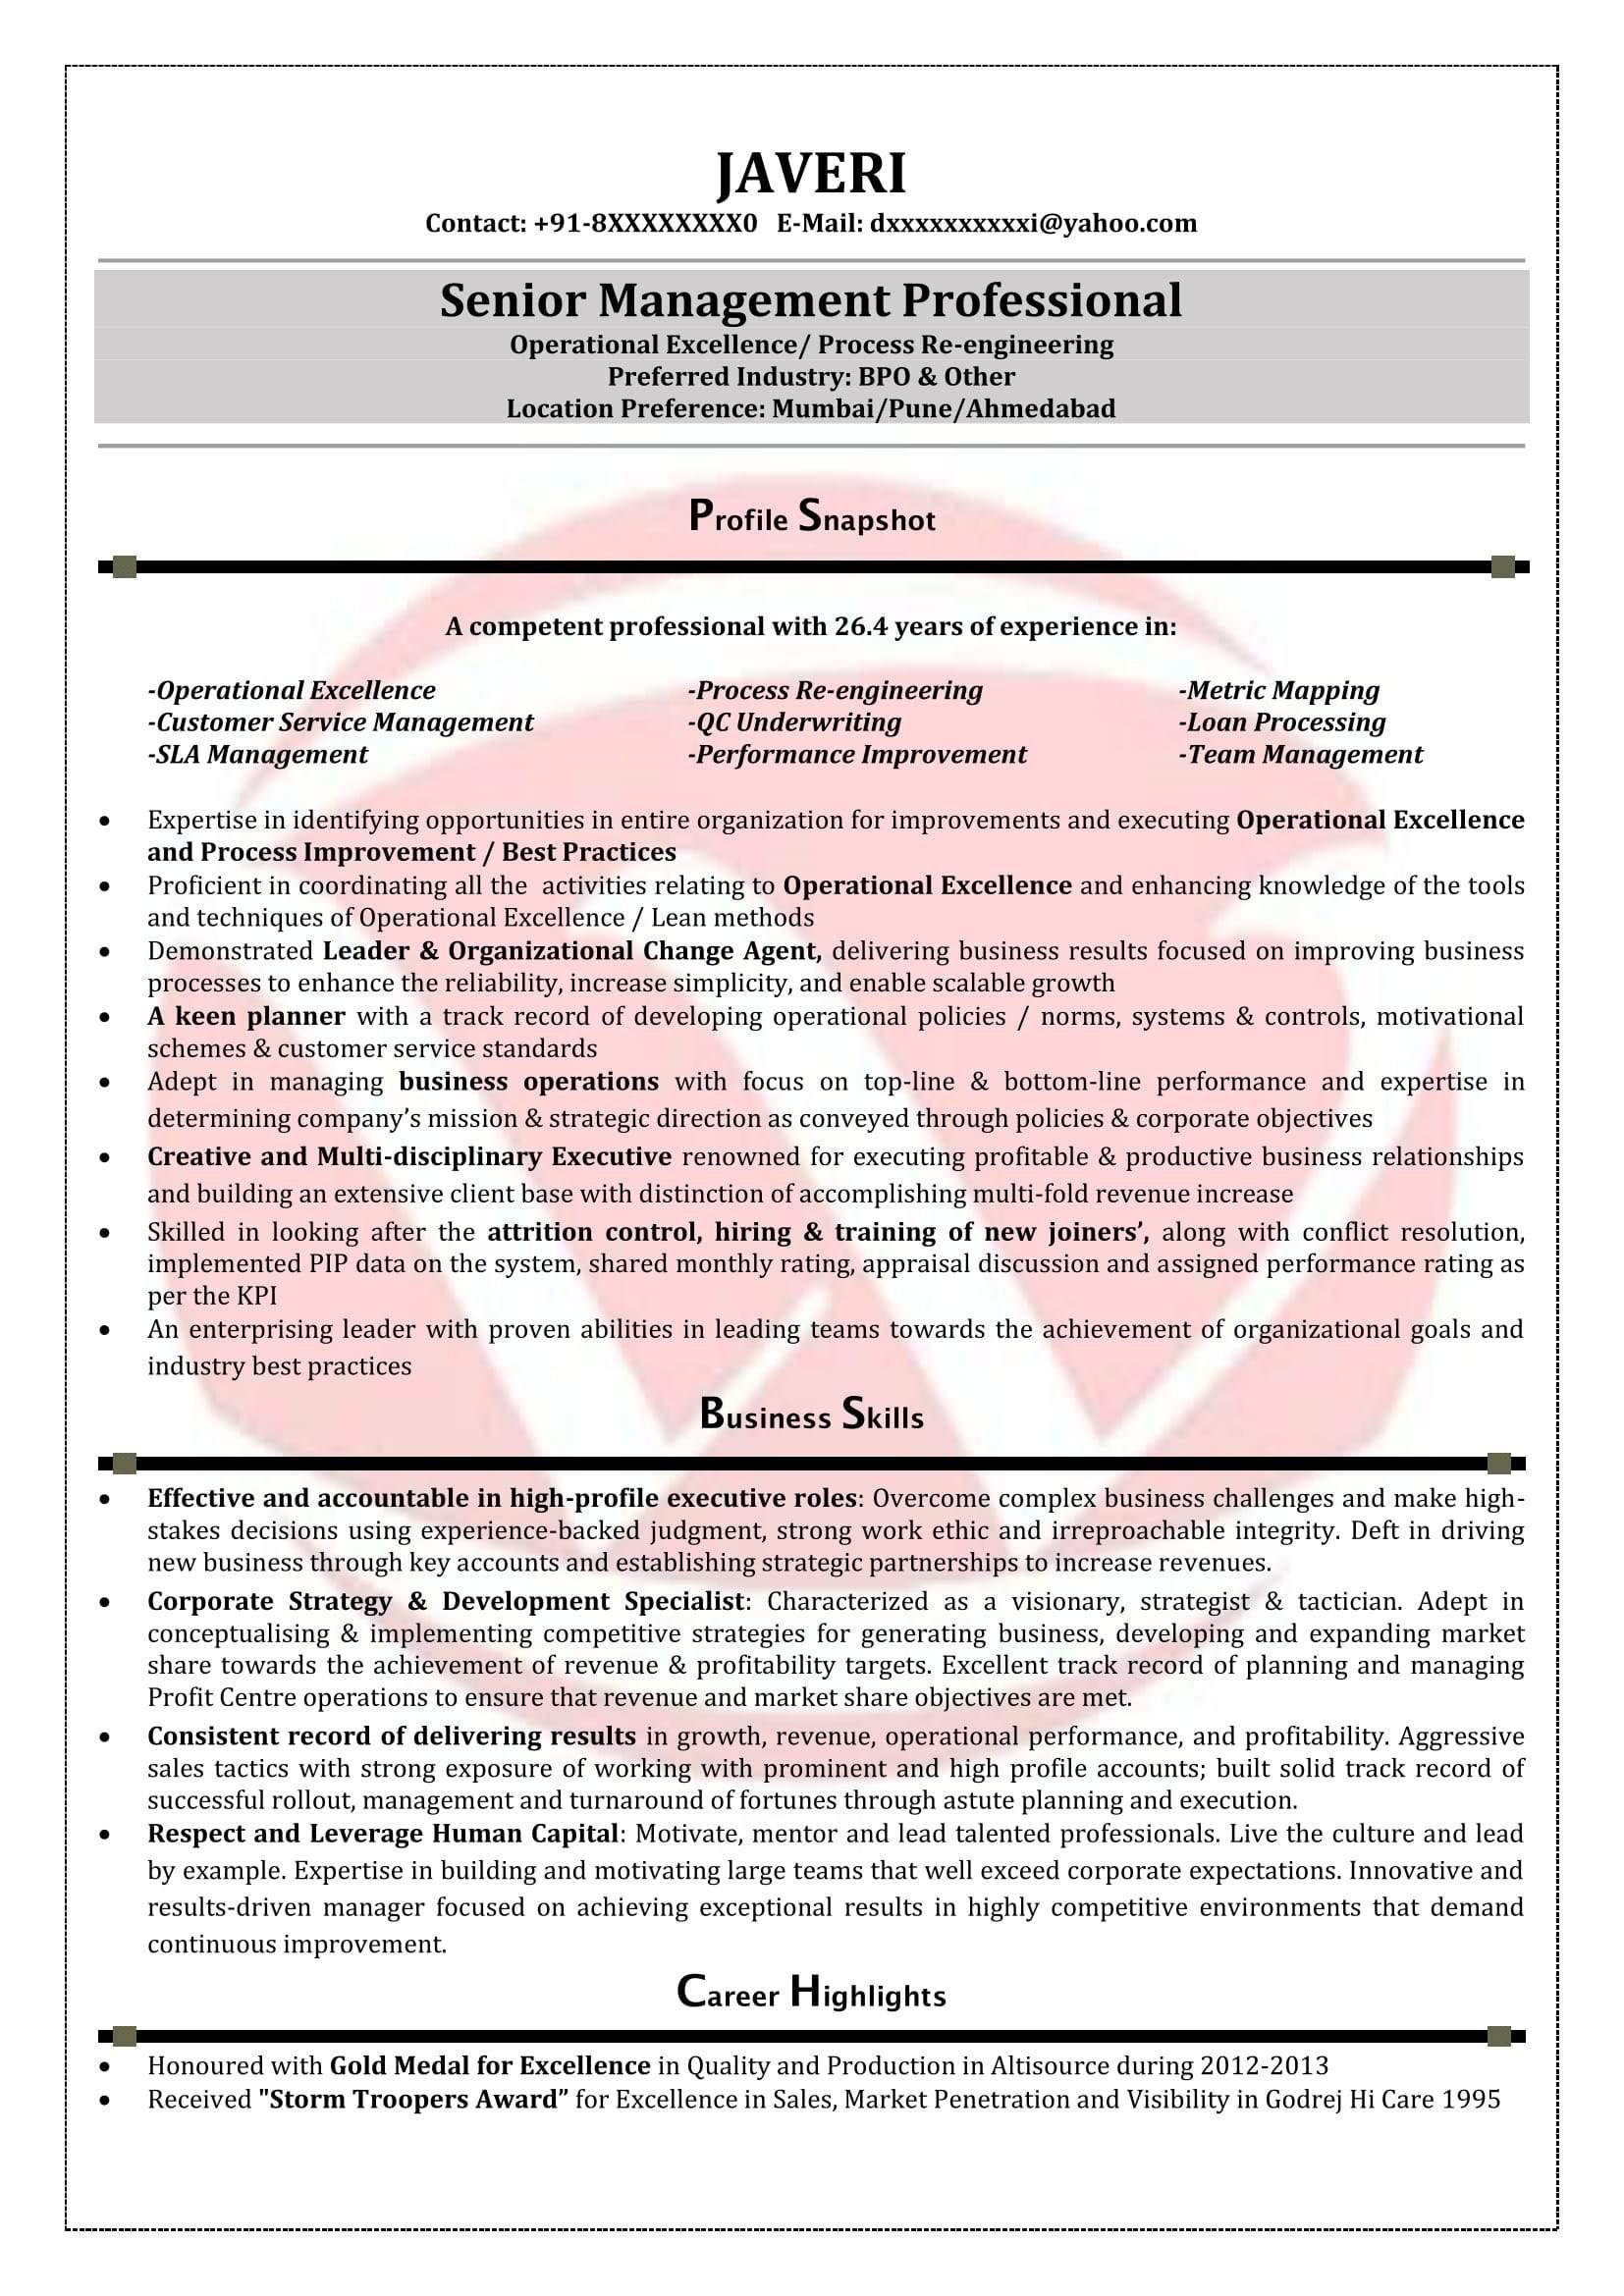 sample resume bpo non voiceml